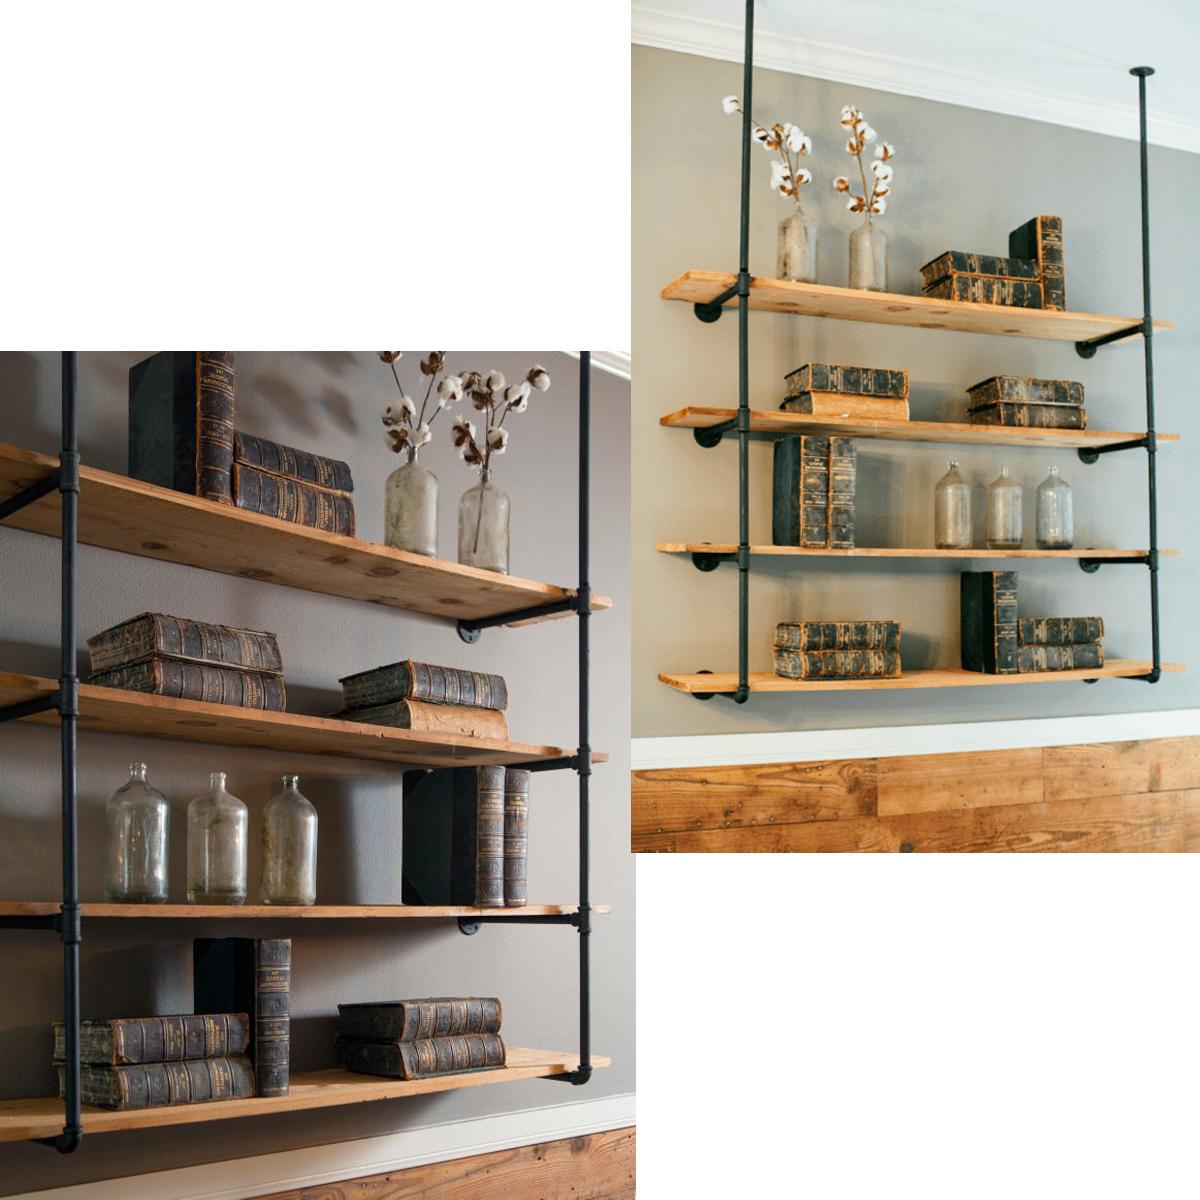 King Do Way Industrial Pipe Wall Shelves Diy Ladder Shelf Floating Wall Mount Shelf Bookshelf Storage